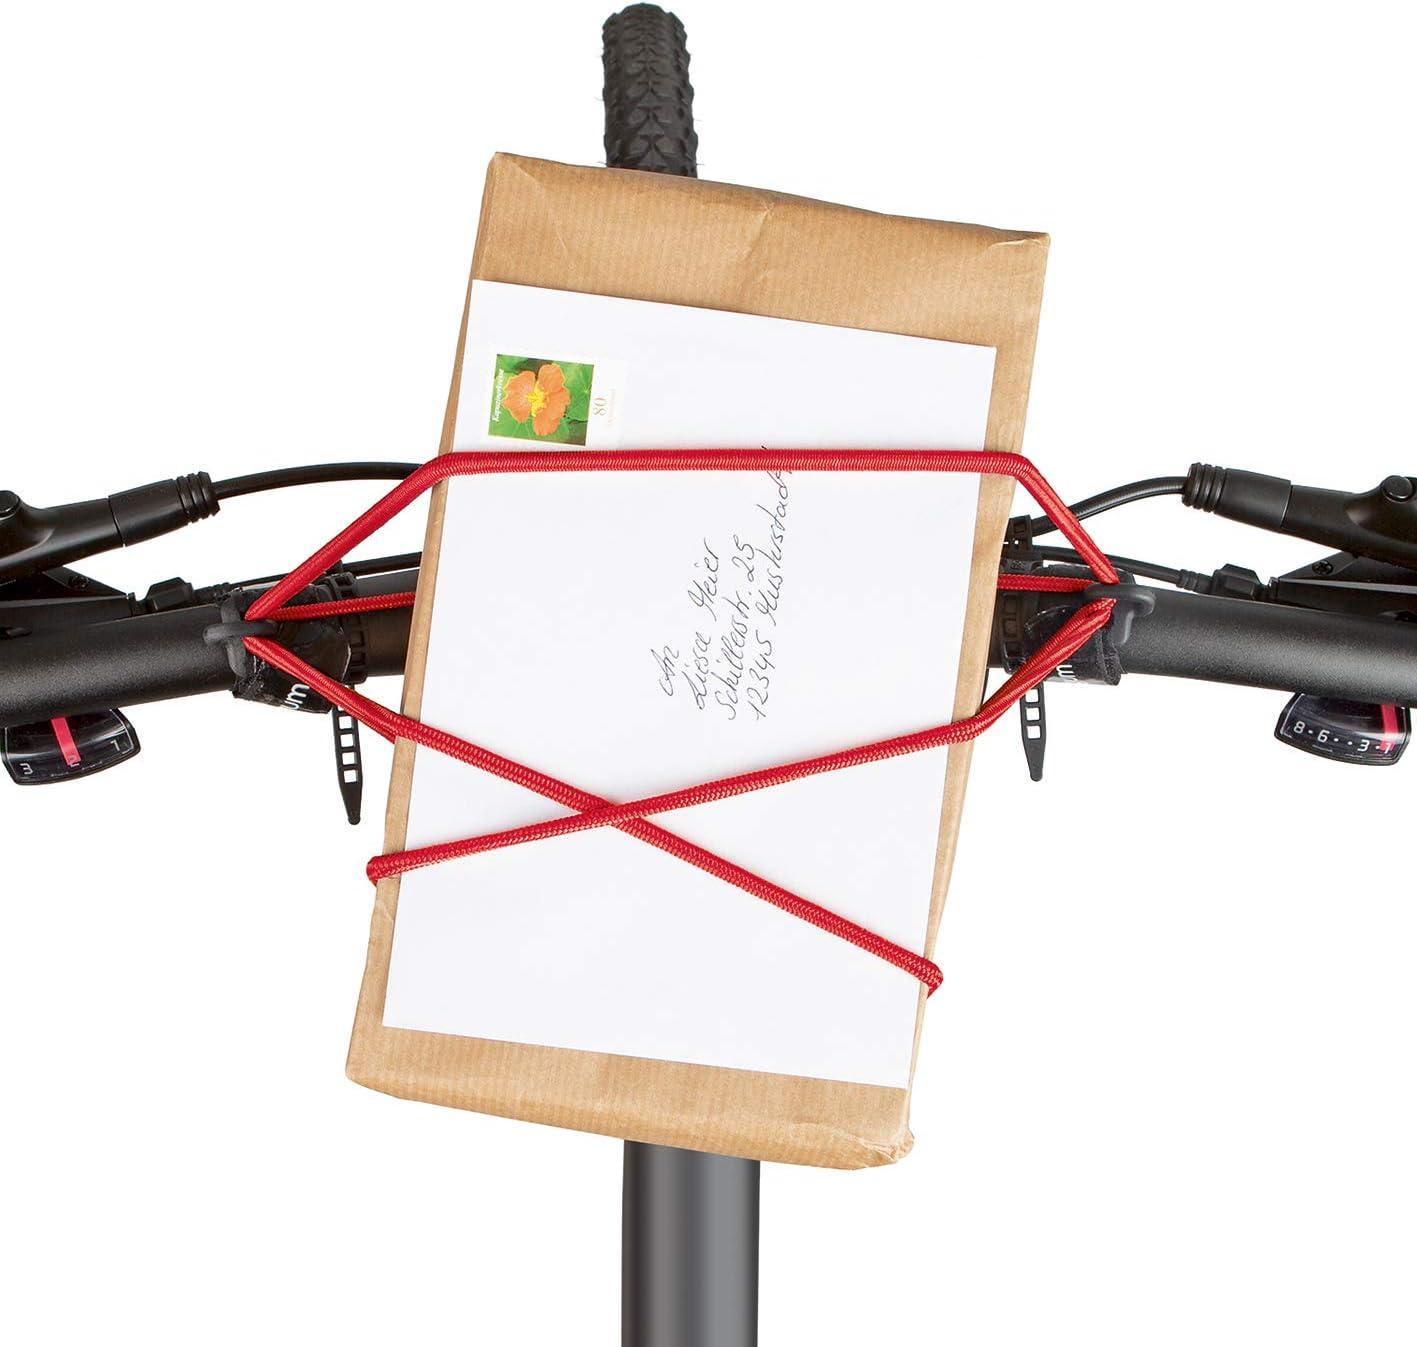 Elastisches Gummiband Gep/äckspanner carryyygum Lenkerspannband 105cm Klettverschluss Mini-Gep/äcktr/äger f Fahrradlenker Spanngummi